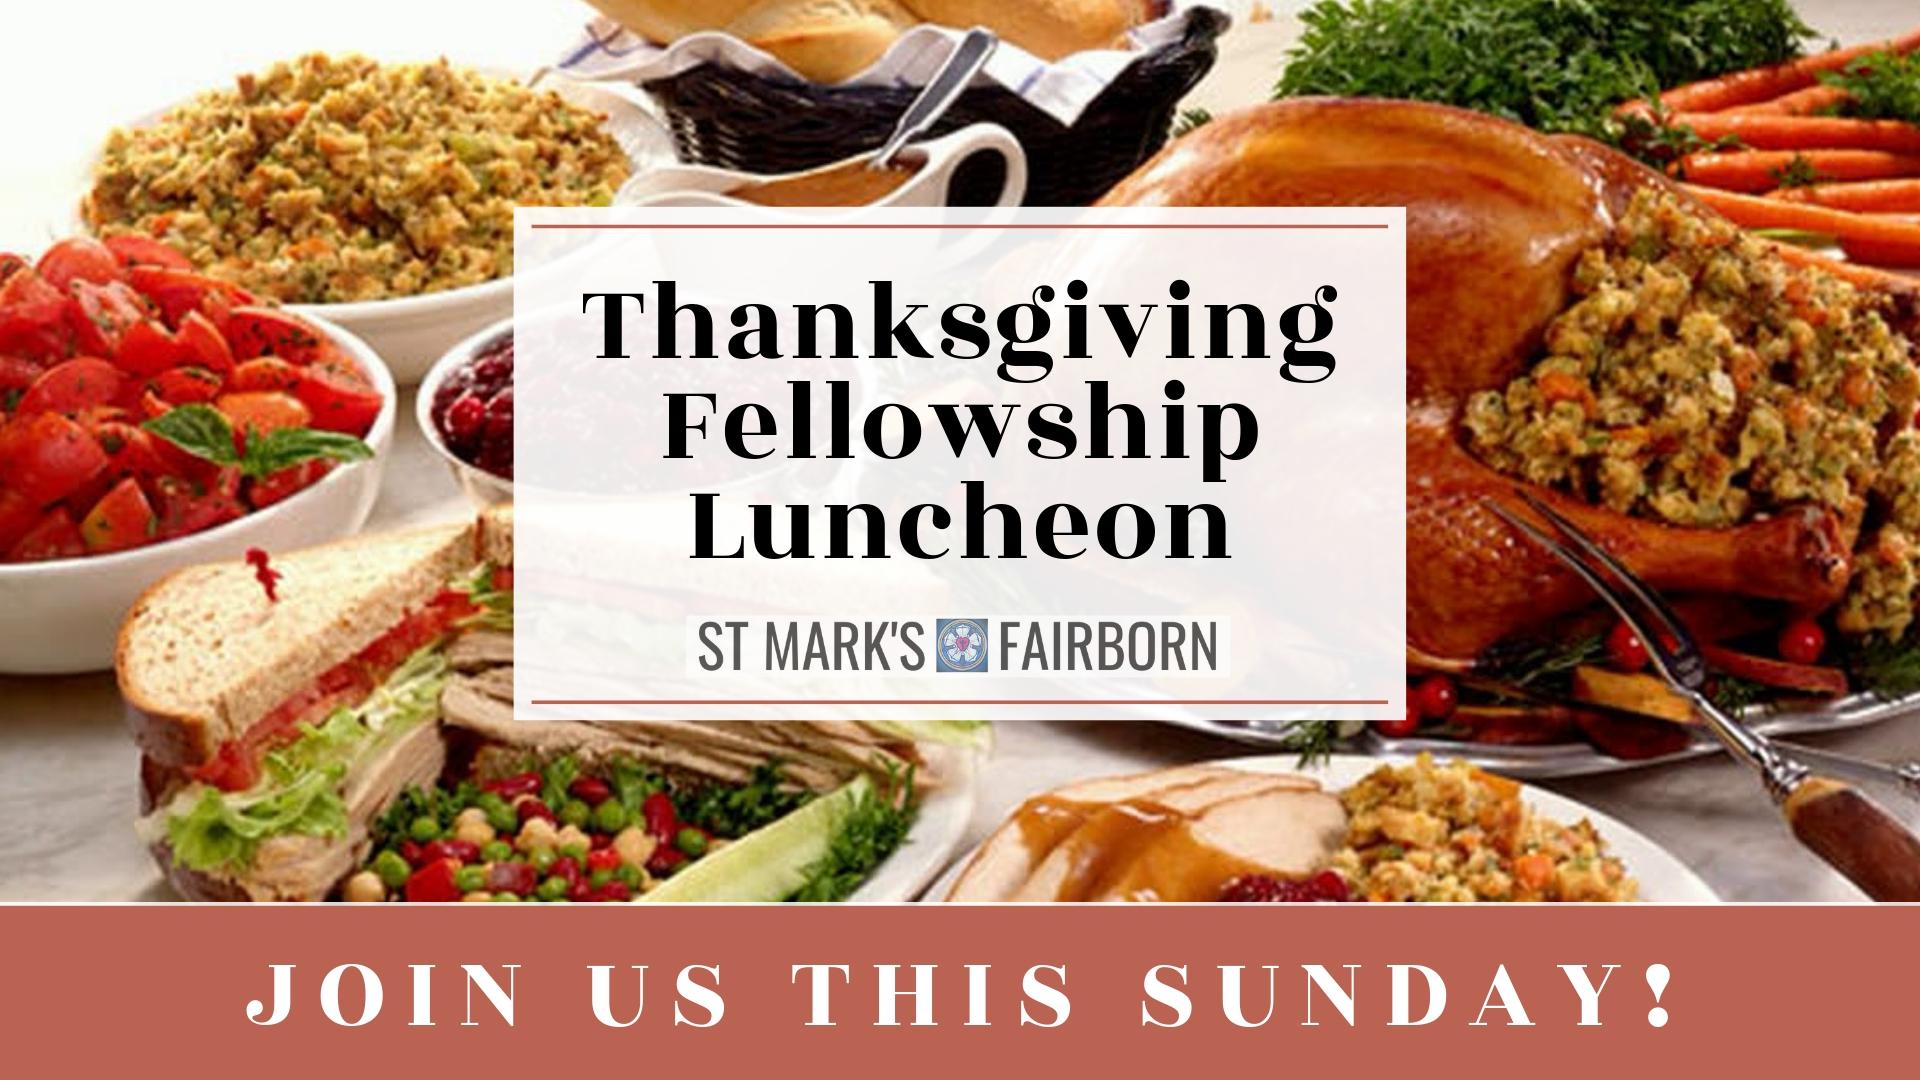 181118-Fellowship-Thanksgiving-thisSunday.jpg